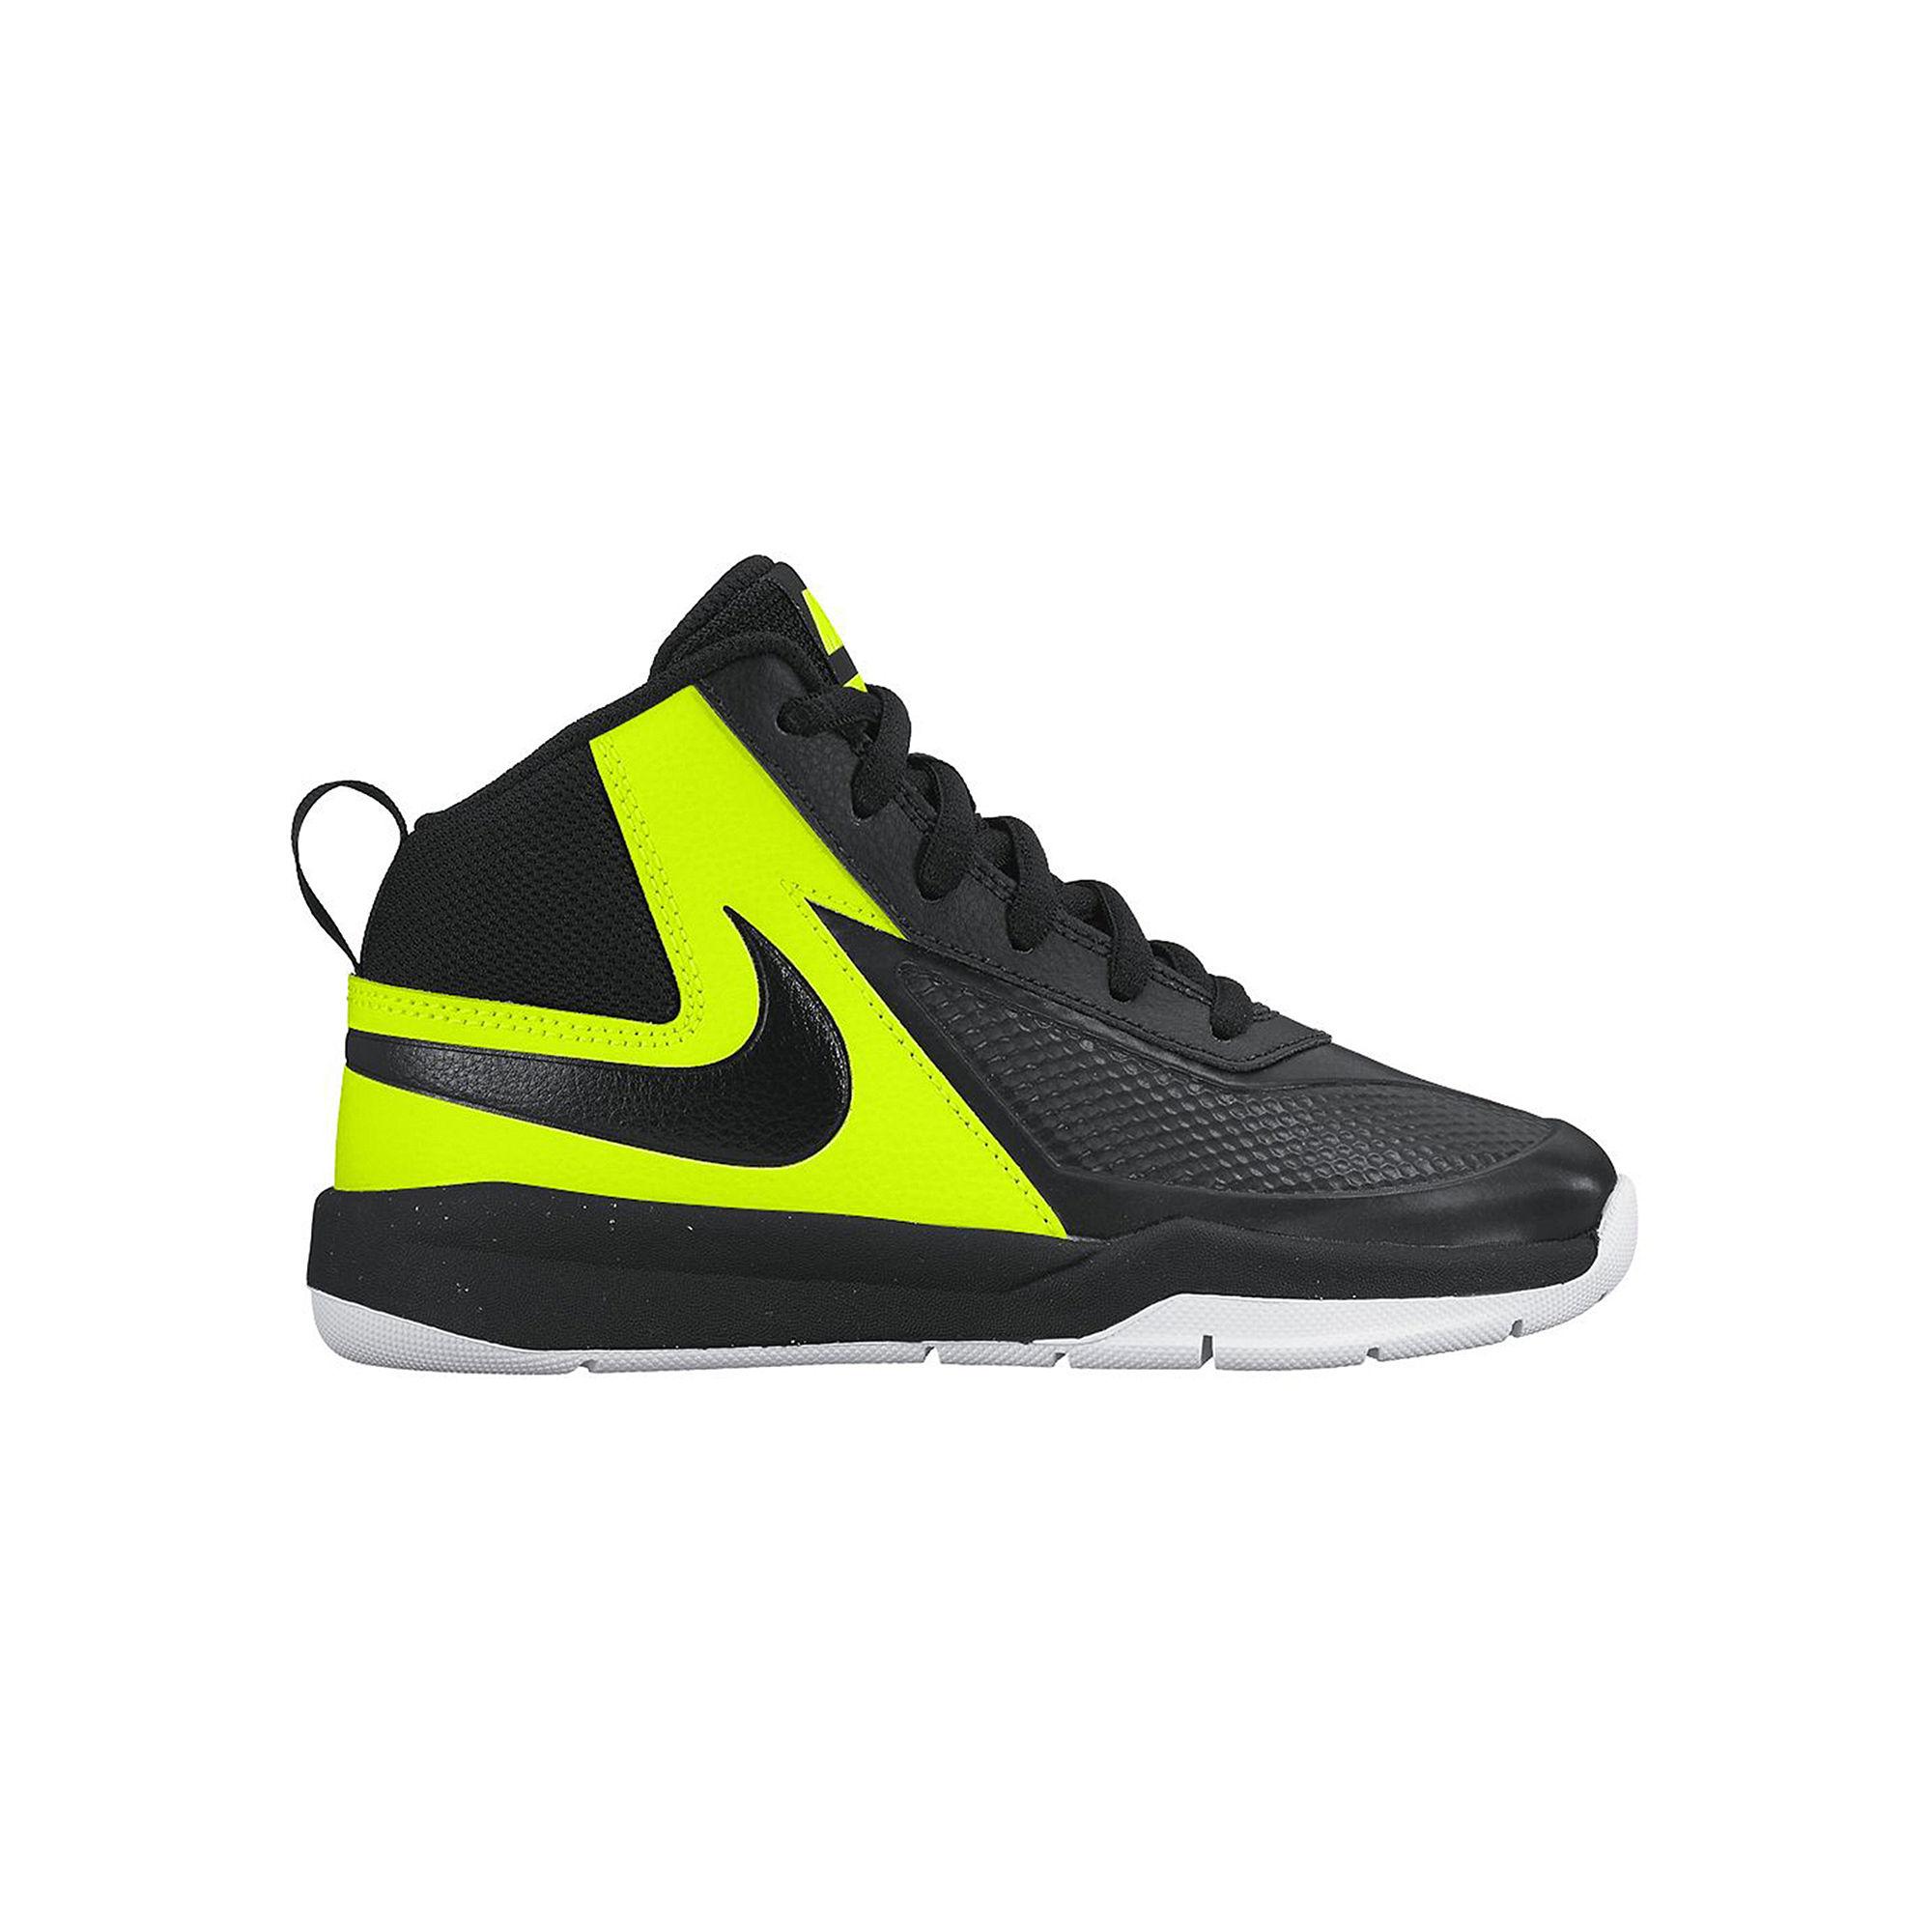 a813e1a38a ... UPC 888409436053 product image for Nike Team Hustle D7 Boys Basketball  Shoes - Little Kids/